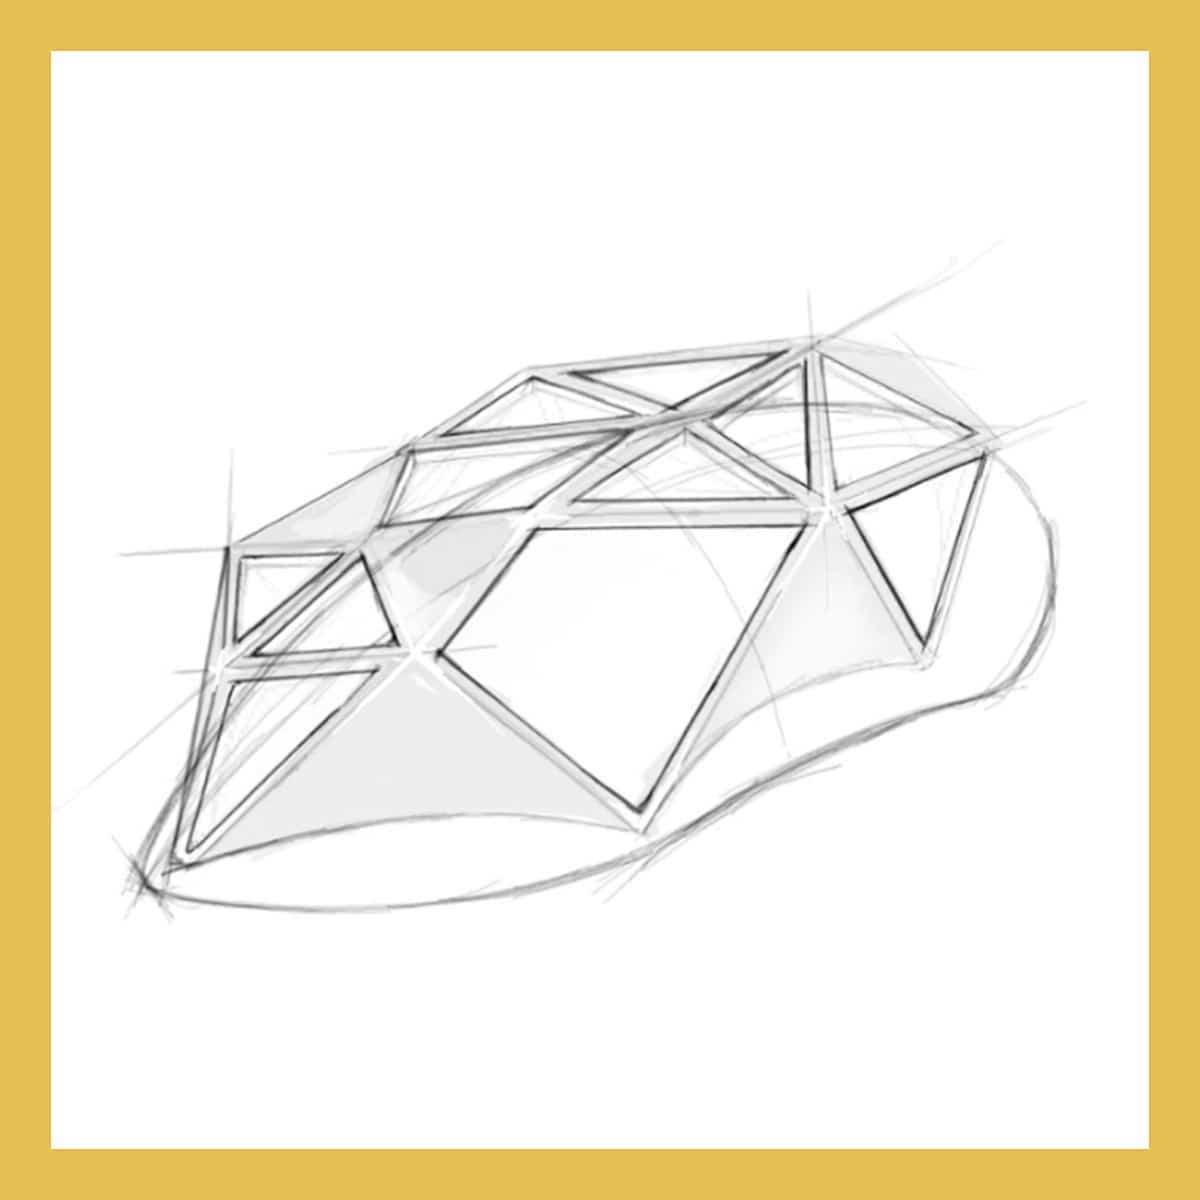 krylik-plant-based-nails-drawing-delivery